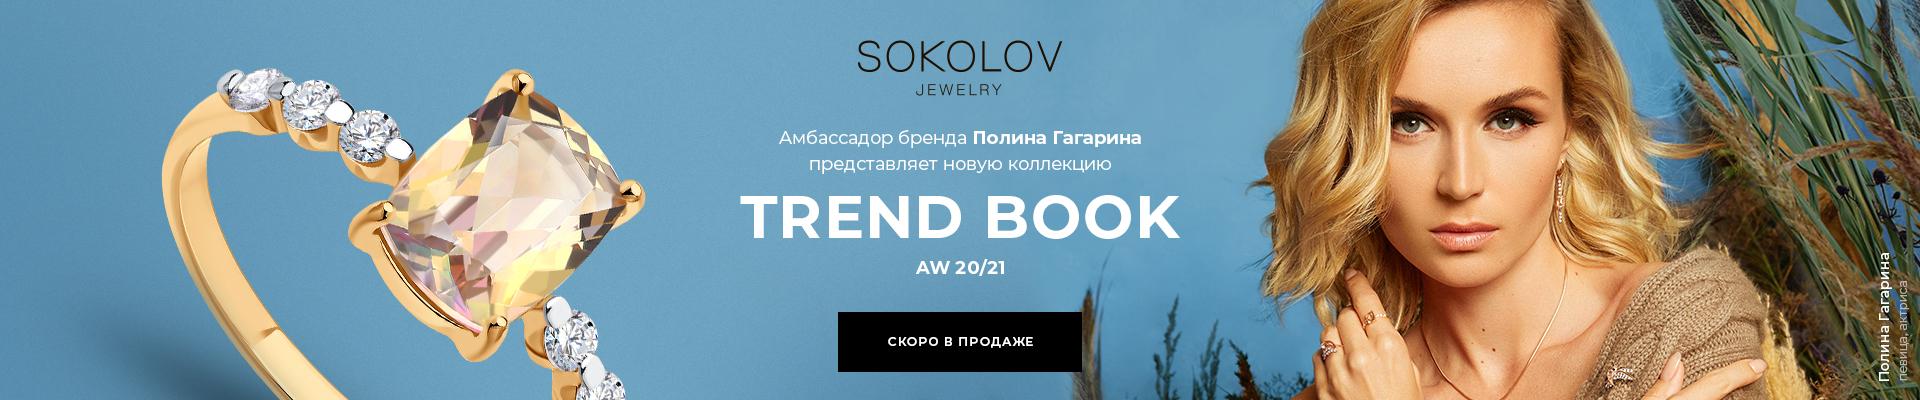 Sokolov Новая коллекция